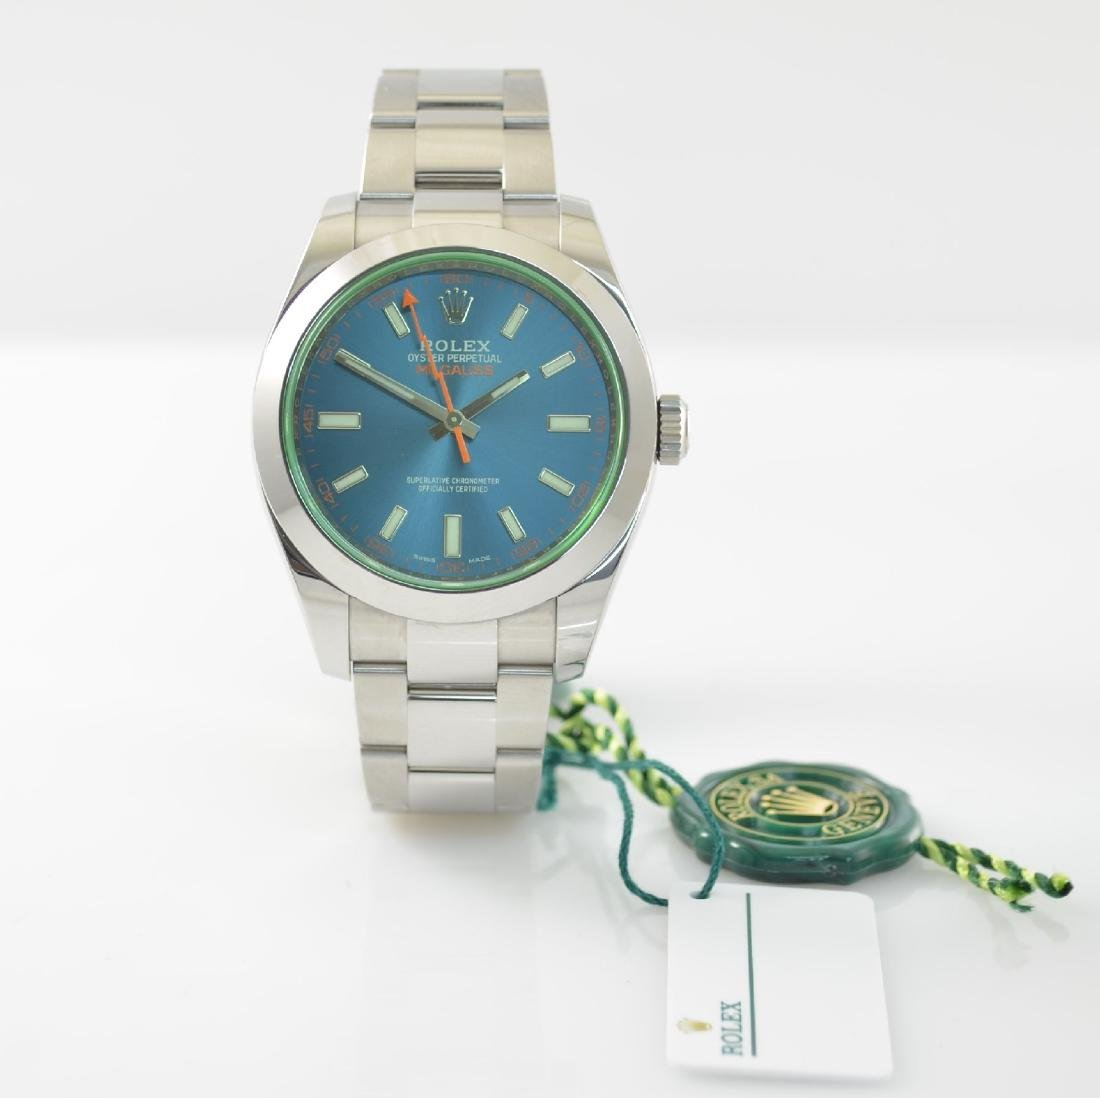 ROLEX wristwatch Oyster Perpetual Milgauss 116400GV - 3